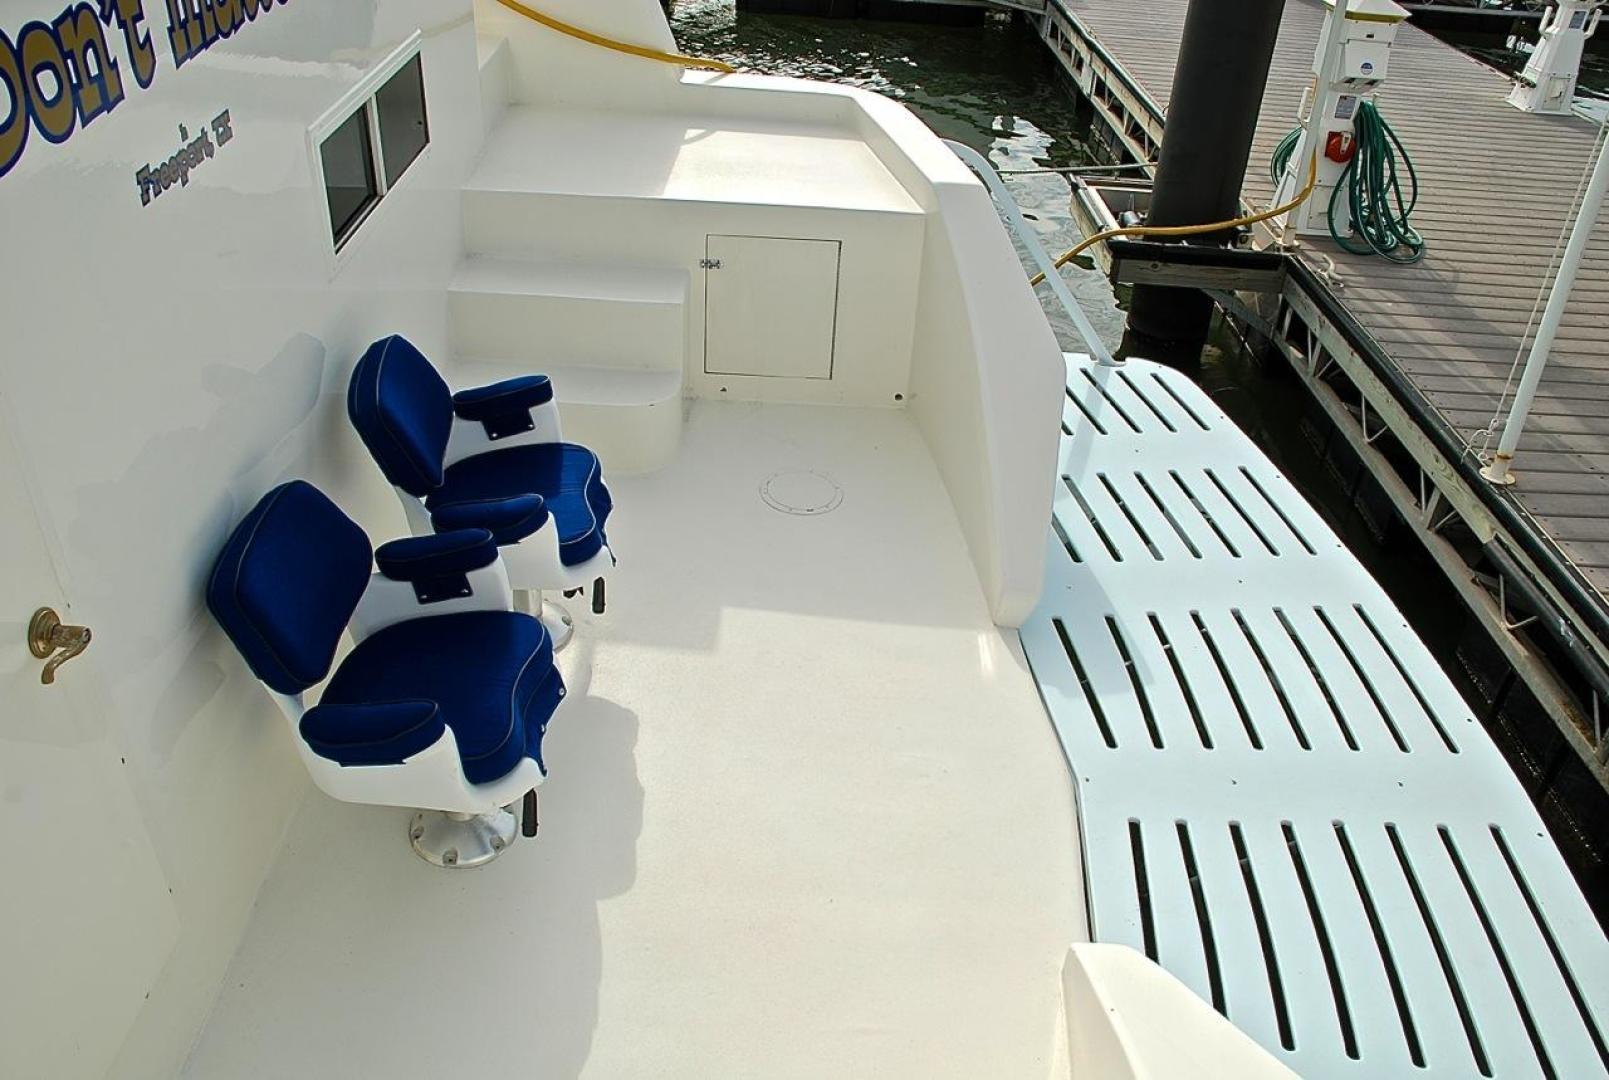 Infinity-Cockpit Motor Yacht 2001-Dont Matter Houston-Texas-United States-Swim Platform-1005575 | Thumbnail